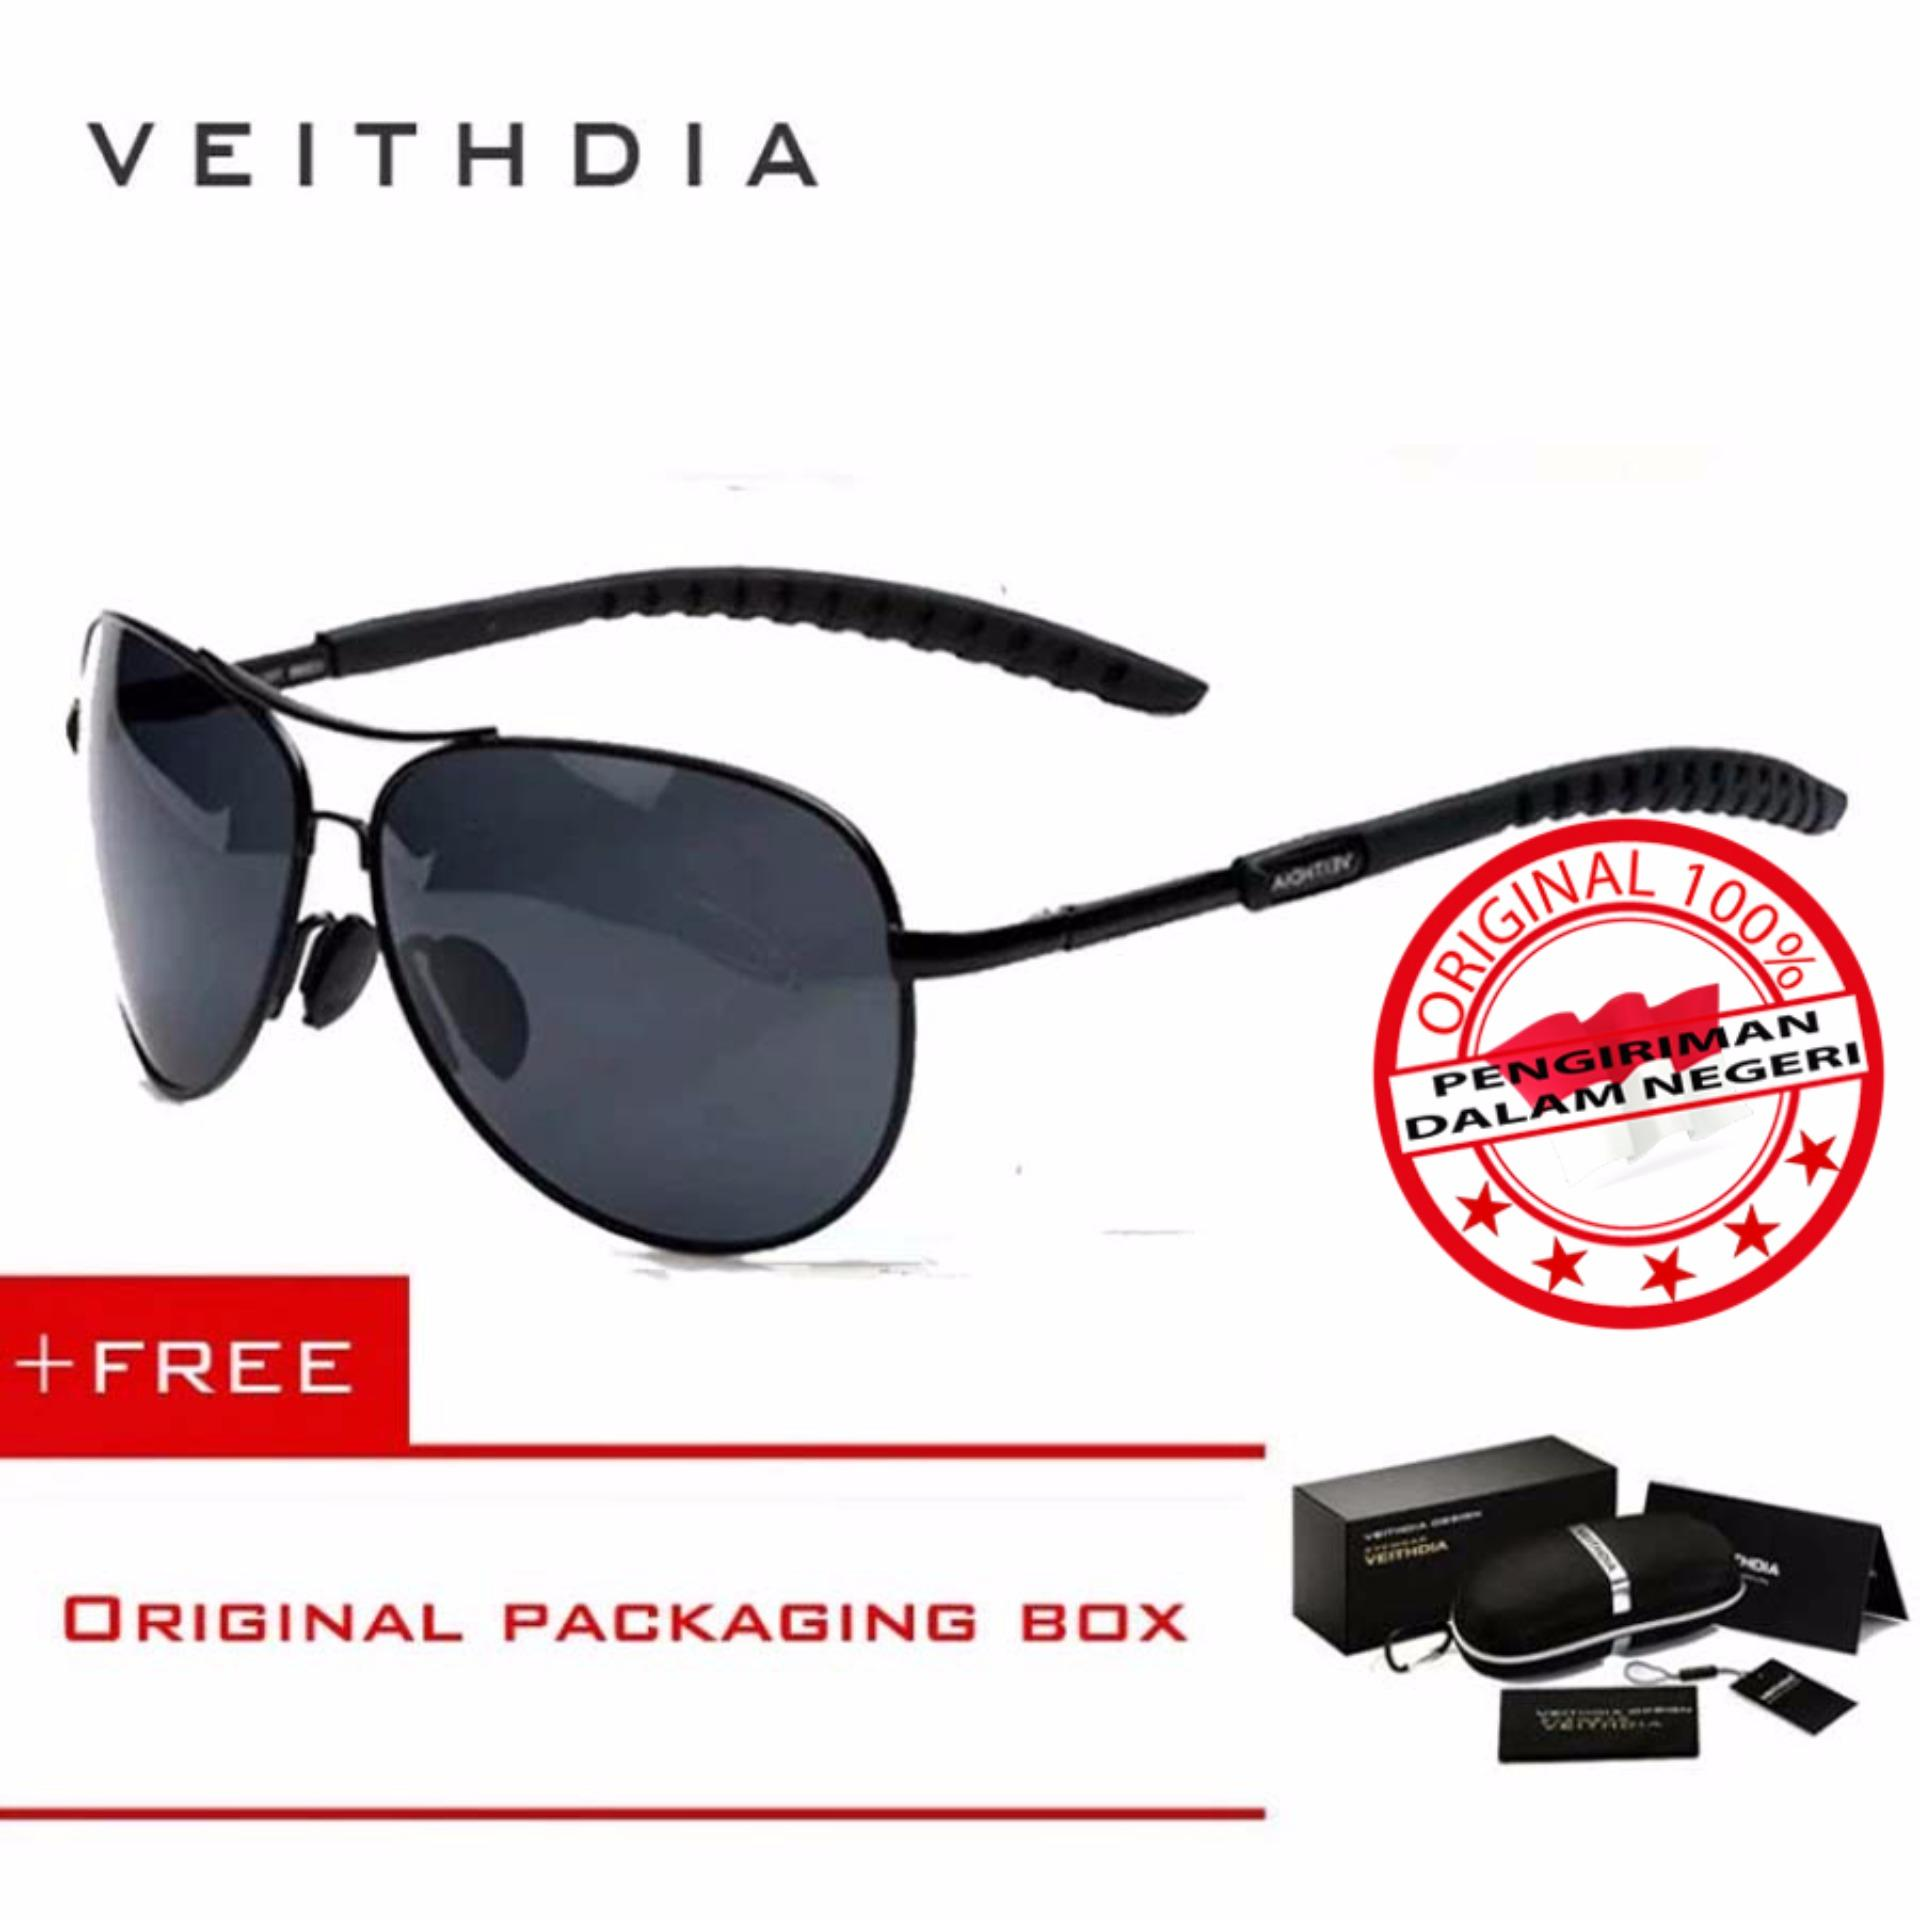 Spesifikasi Veithdia Kacamata Pria Hitam Aluminium Sport Dan Travel Elegant Mirrored Uv400 Polarized Sunglasses 3088 Free Kotak Hardcase Veithdia